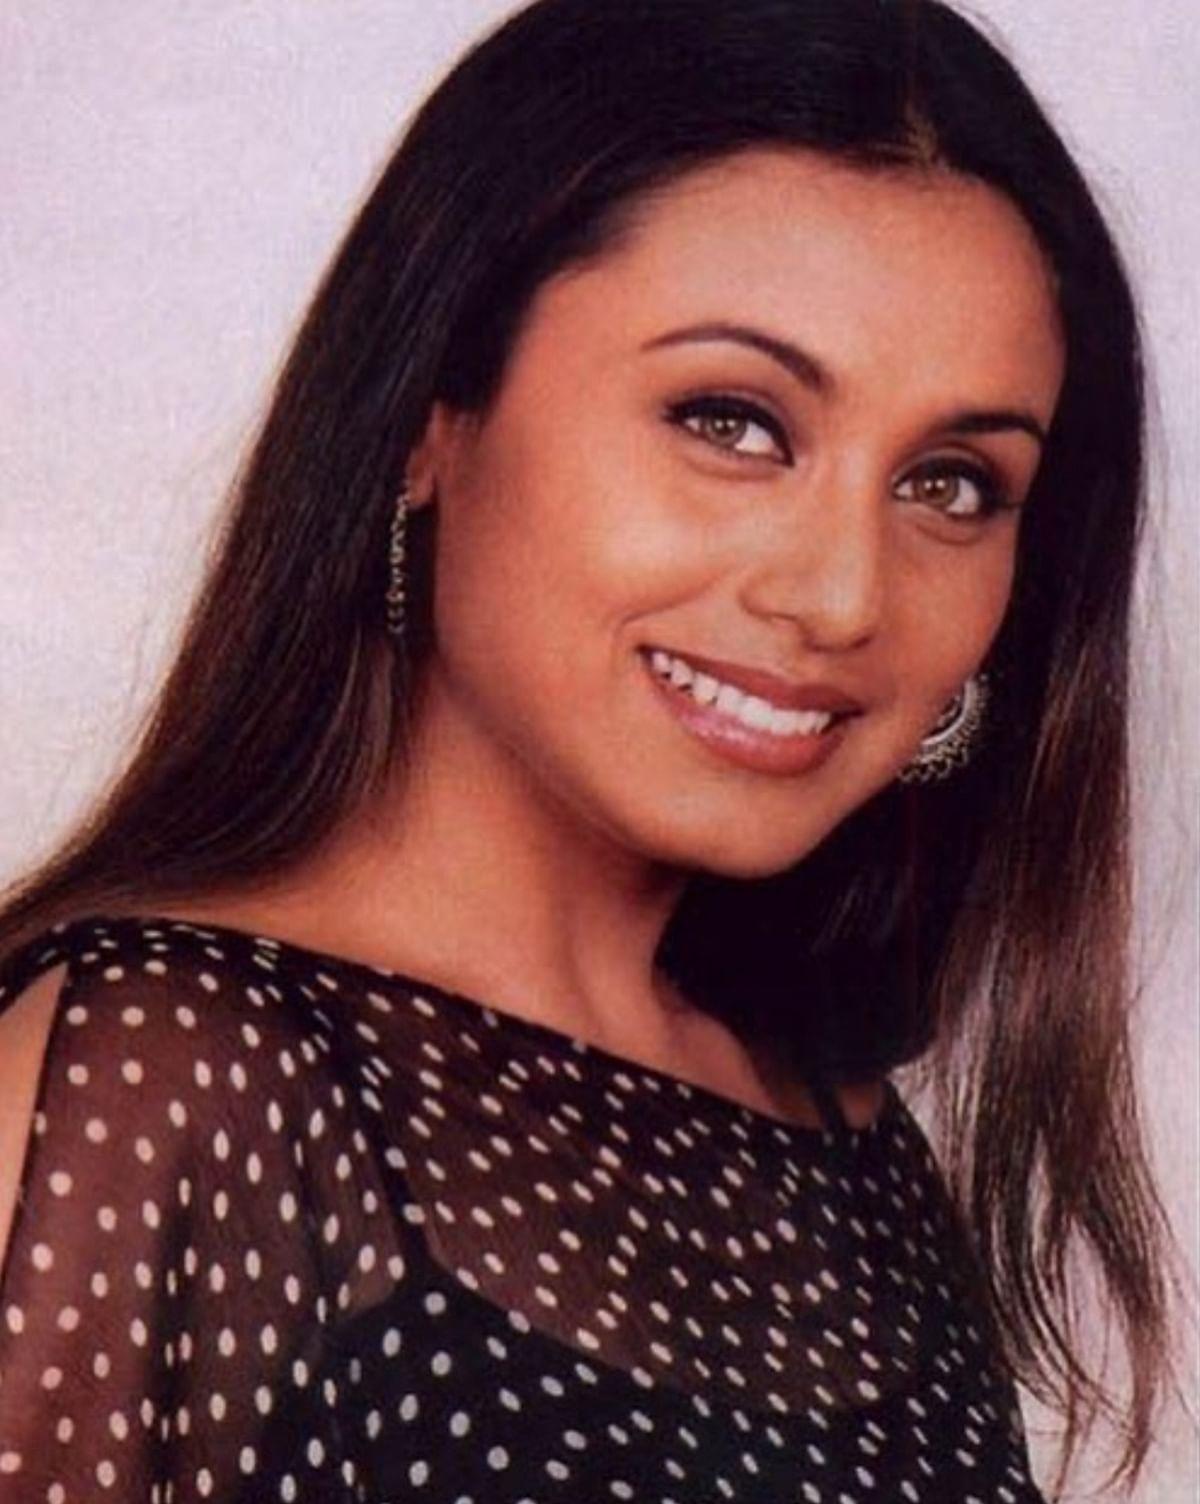 Actress Rani Mukherji